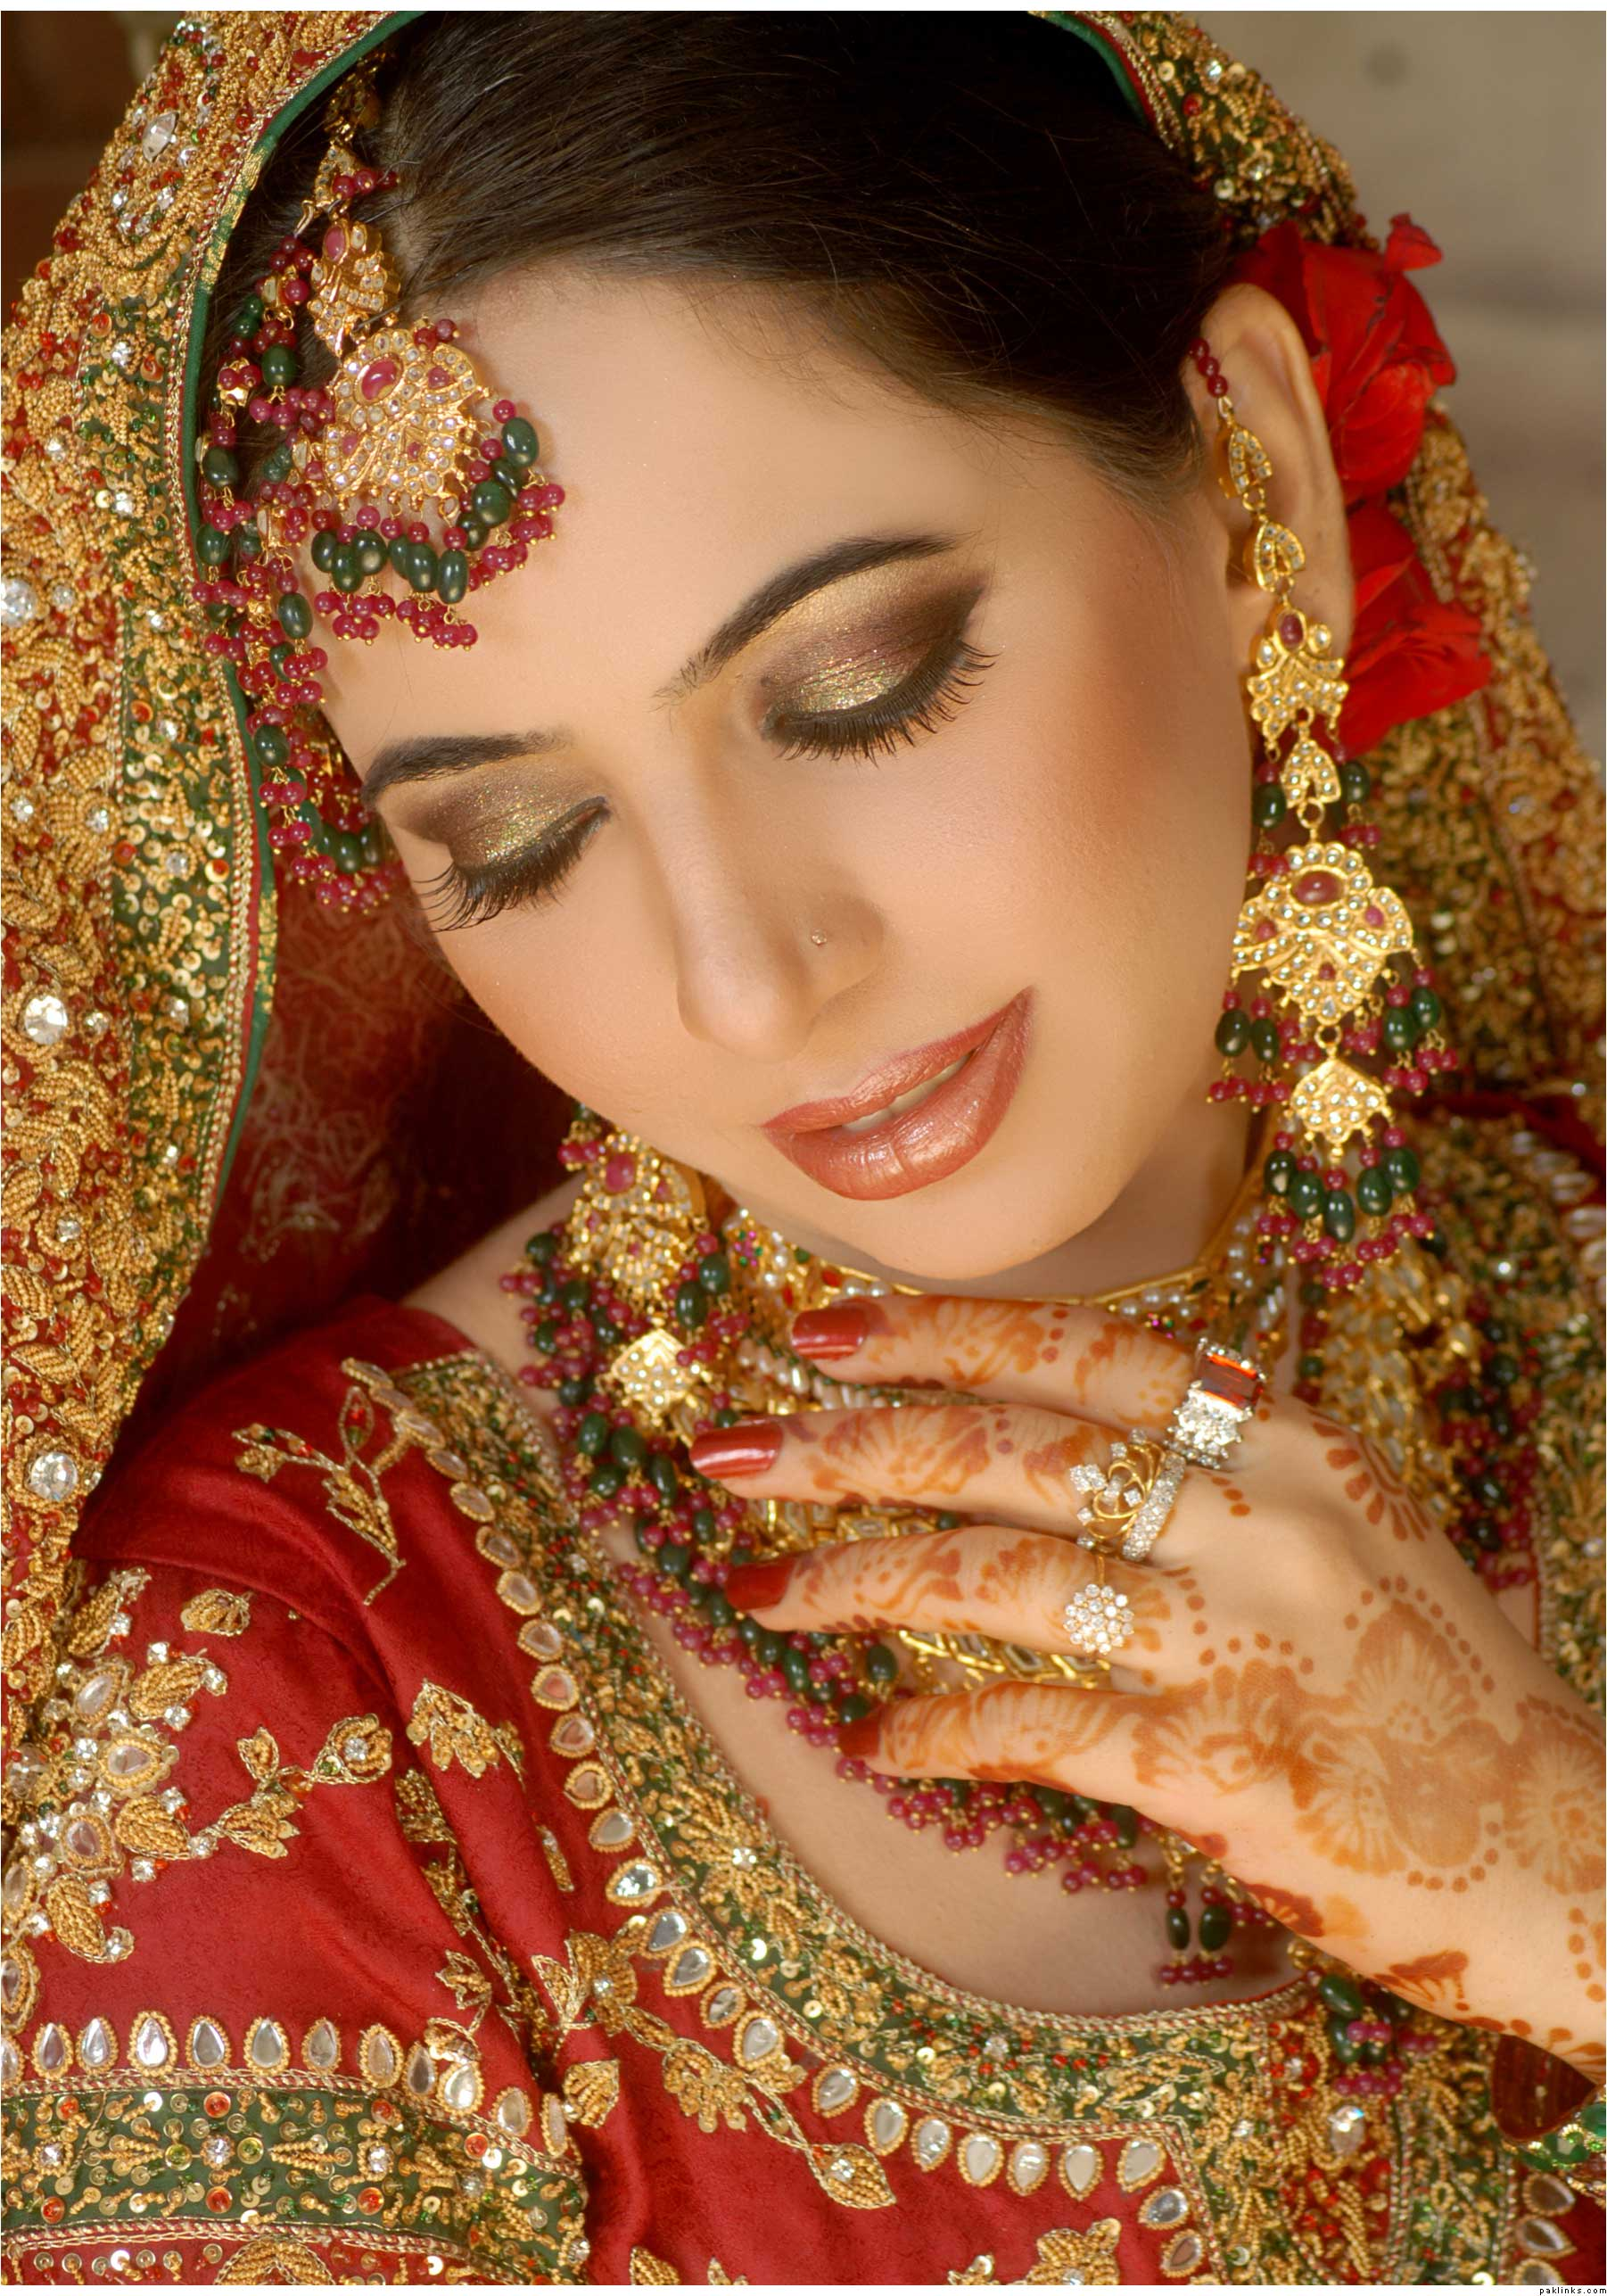 Saree clipart indian bridal 4 Stylishwife Pakistan Brautschmuck Teil